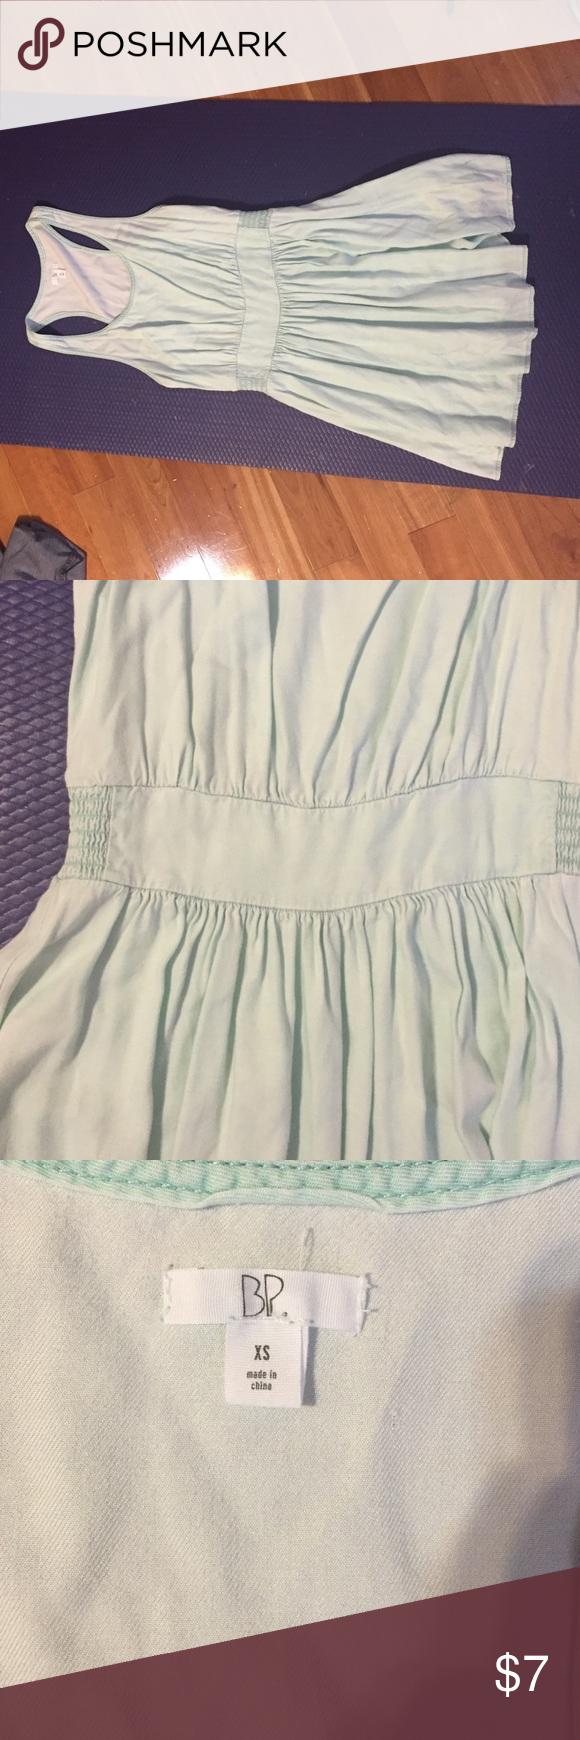 Nordstrom BP Mint Dress Worn once, light plain dress Dresses Mini